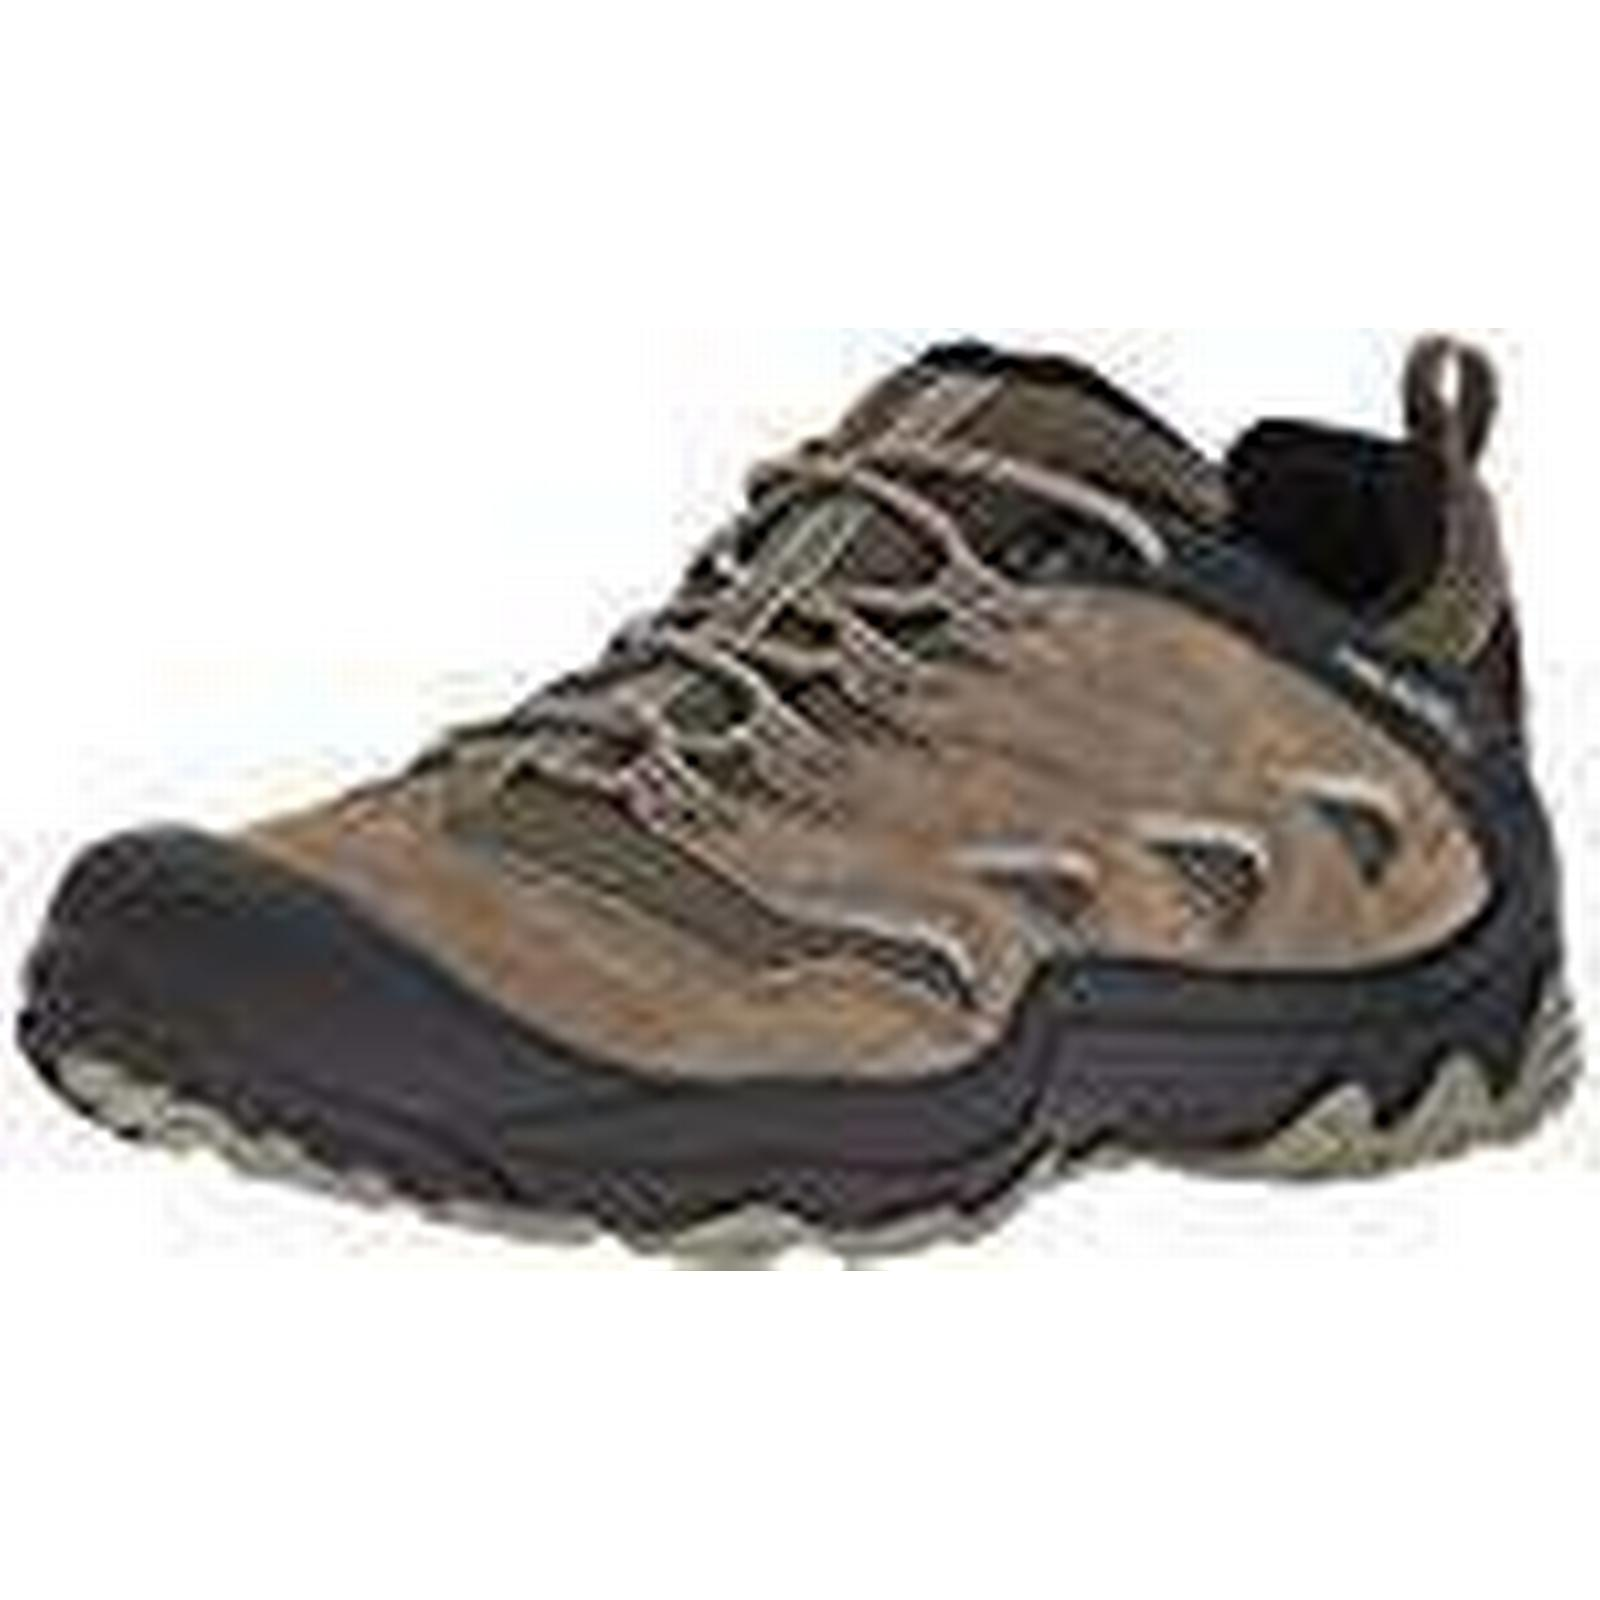 Merrell Men Cham 7 Limit Green Low Rise Hiking Boots, Green Limit (Dusty Olive), 9.5 UK (44 EU) 8ea778